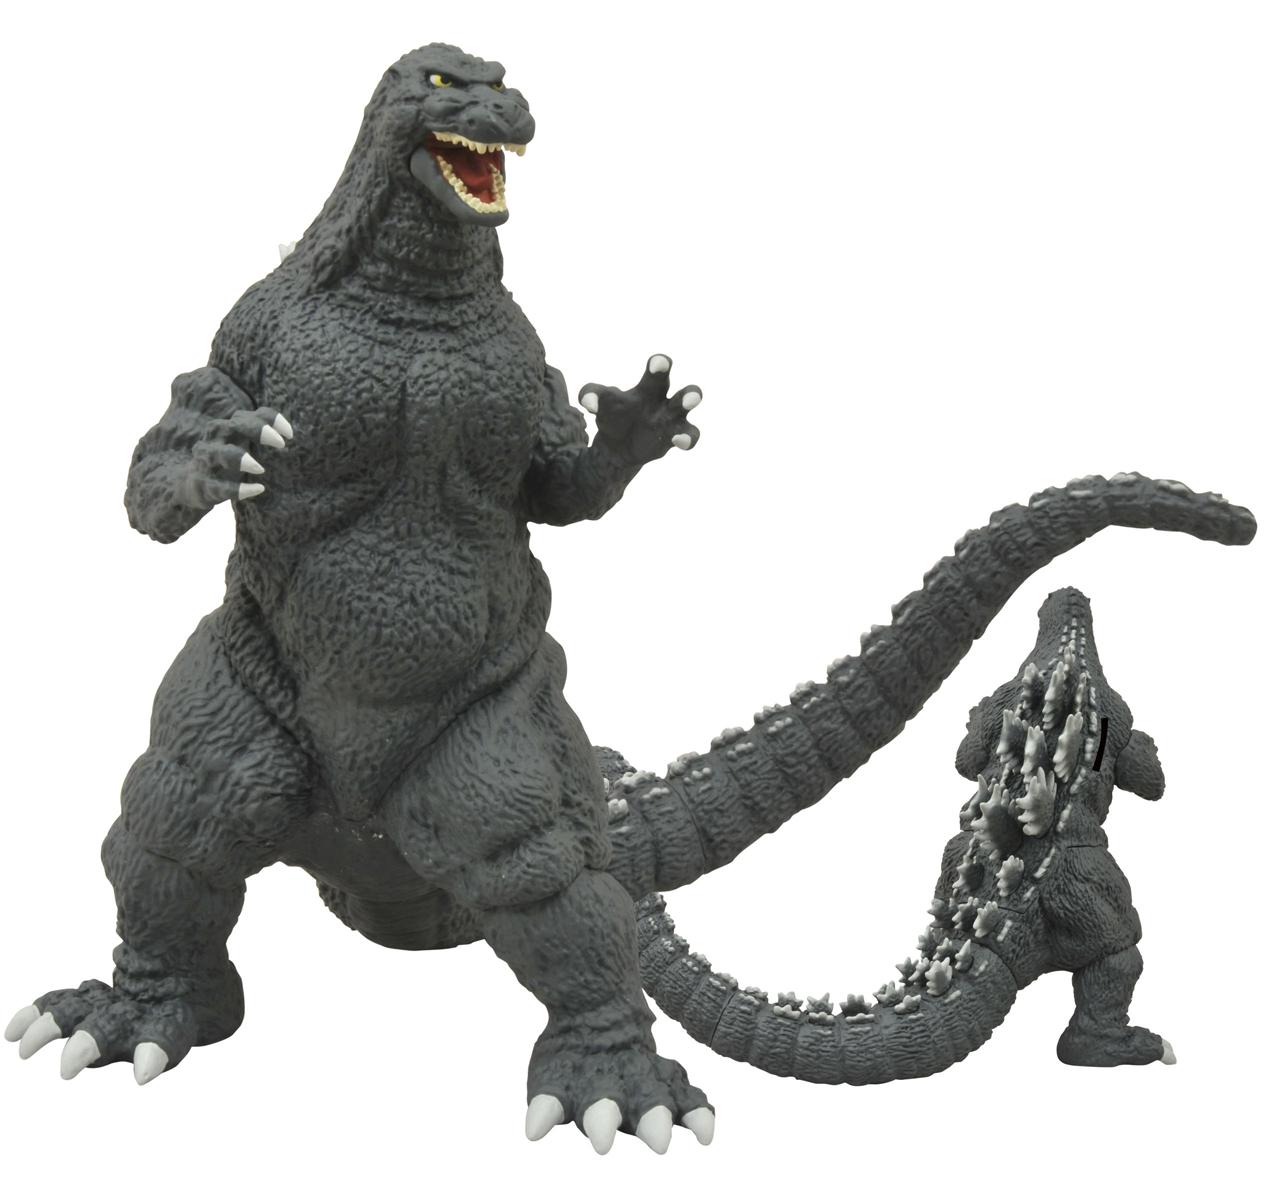 Godzilla 1989 Vinyl Figure Coin Bank